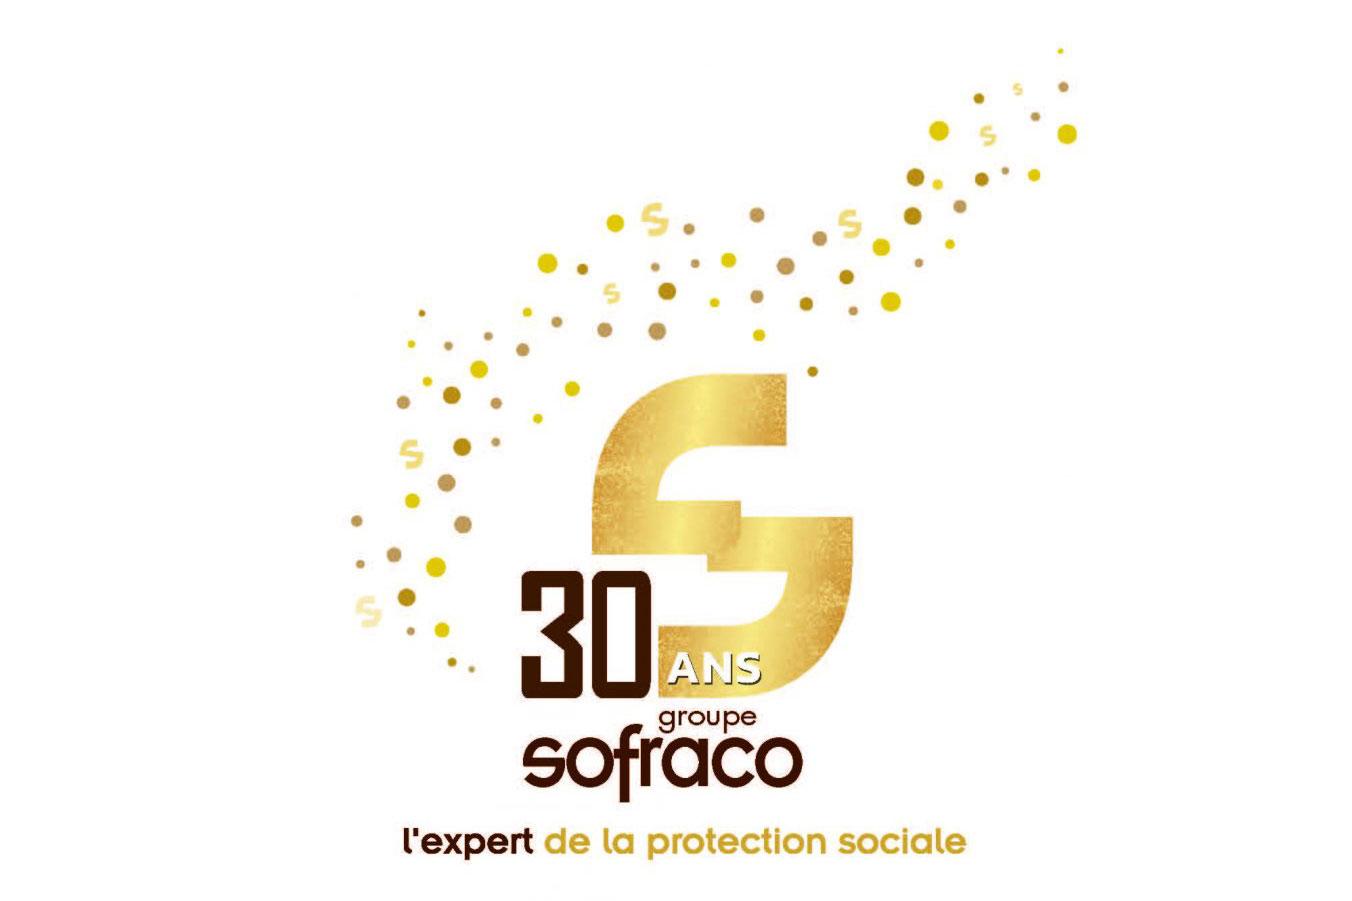 logo-sofraco-30ans-bulles-intitule-vector-e1513201557203